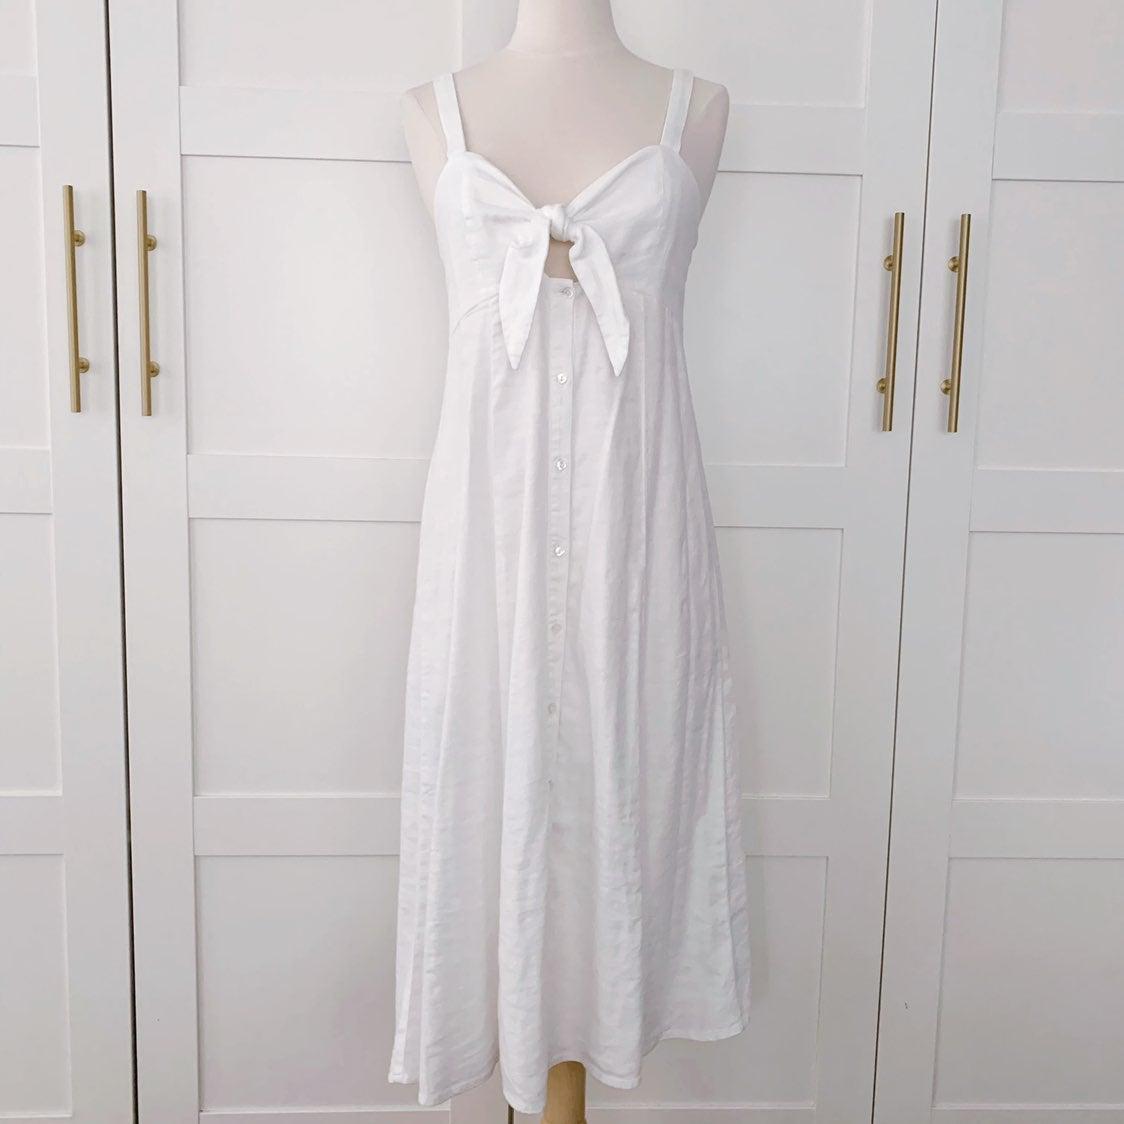 NWT Splendid Linen Bow Front Dress